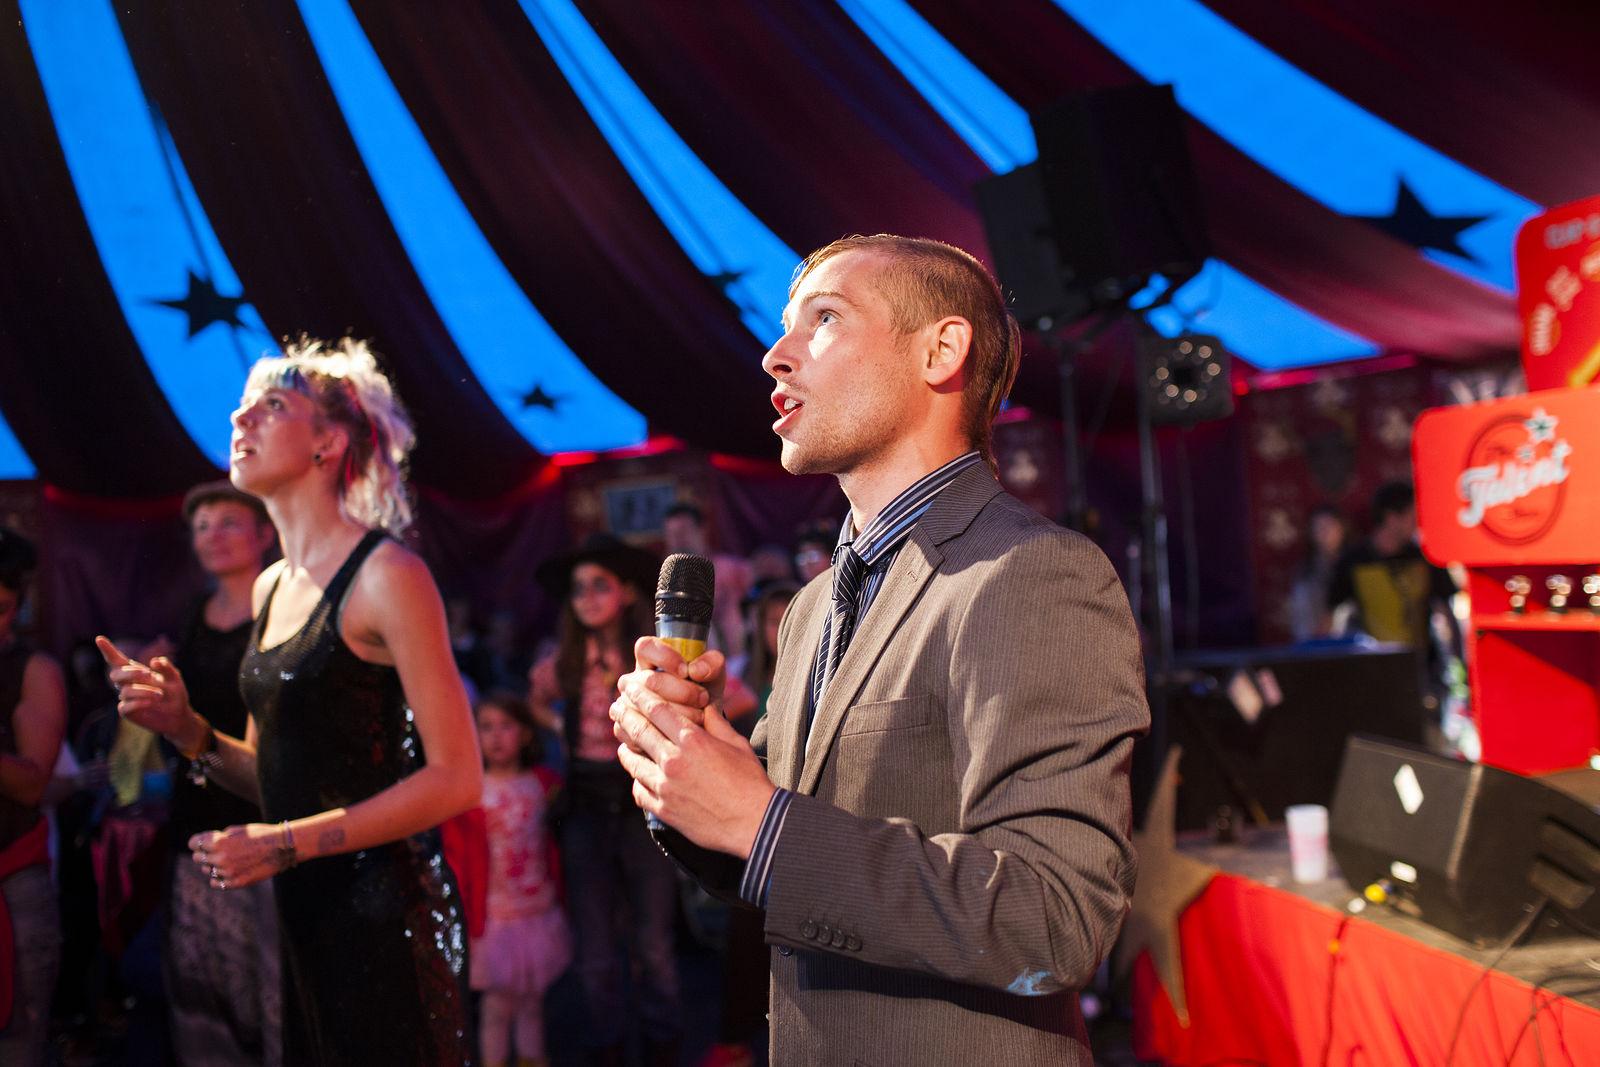 Talent Contest & The Social Club